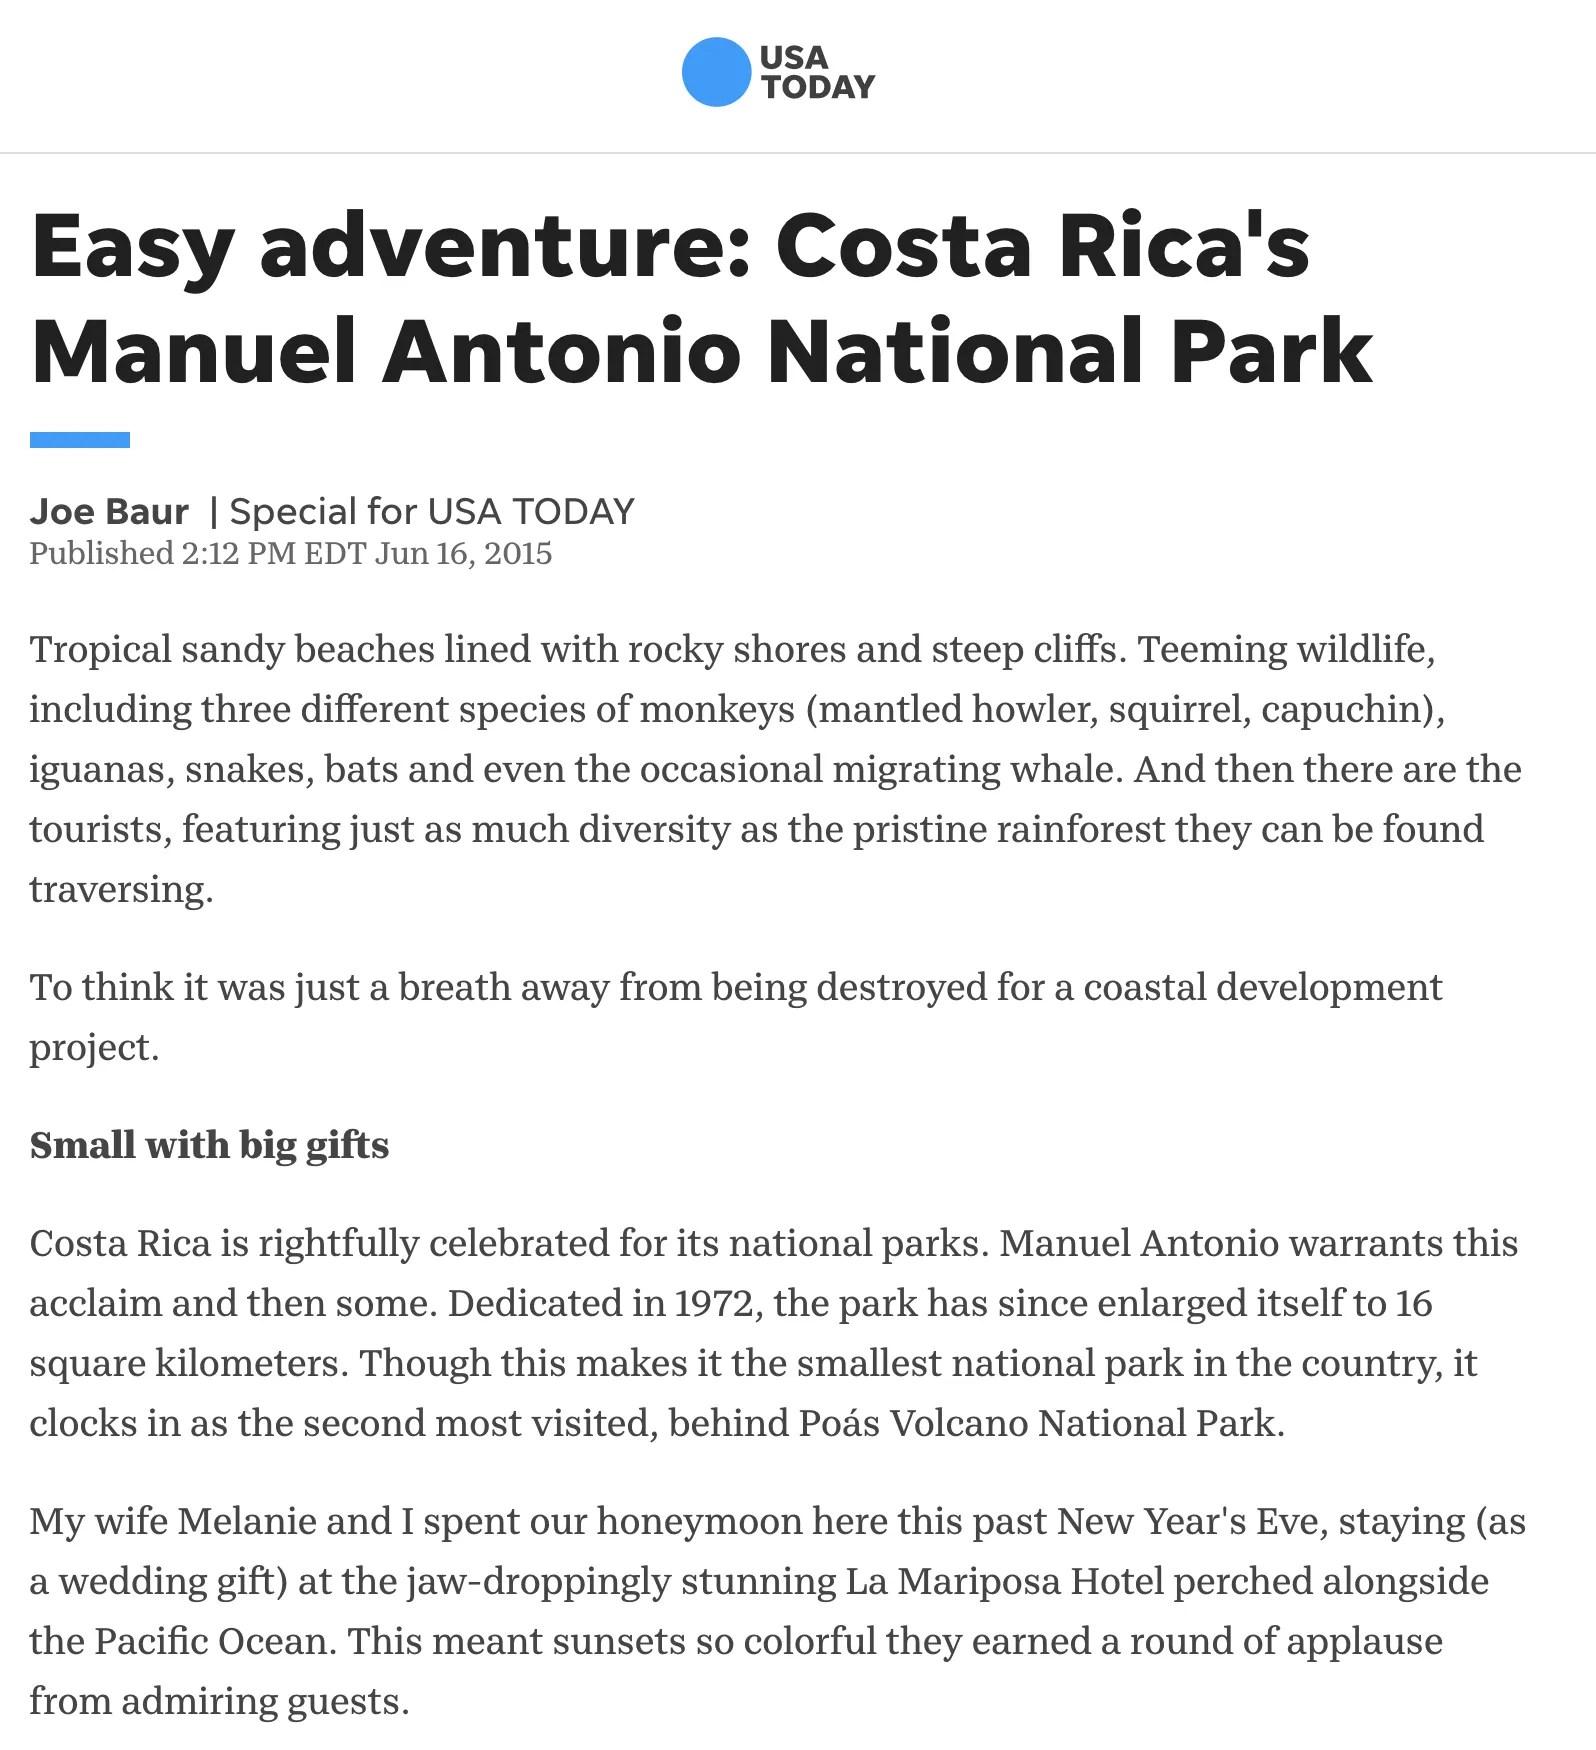 Easy adventure | Costa Rica's Manuel Antonio National Park - USA Today